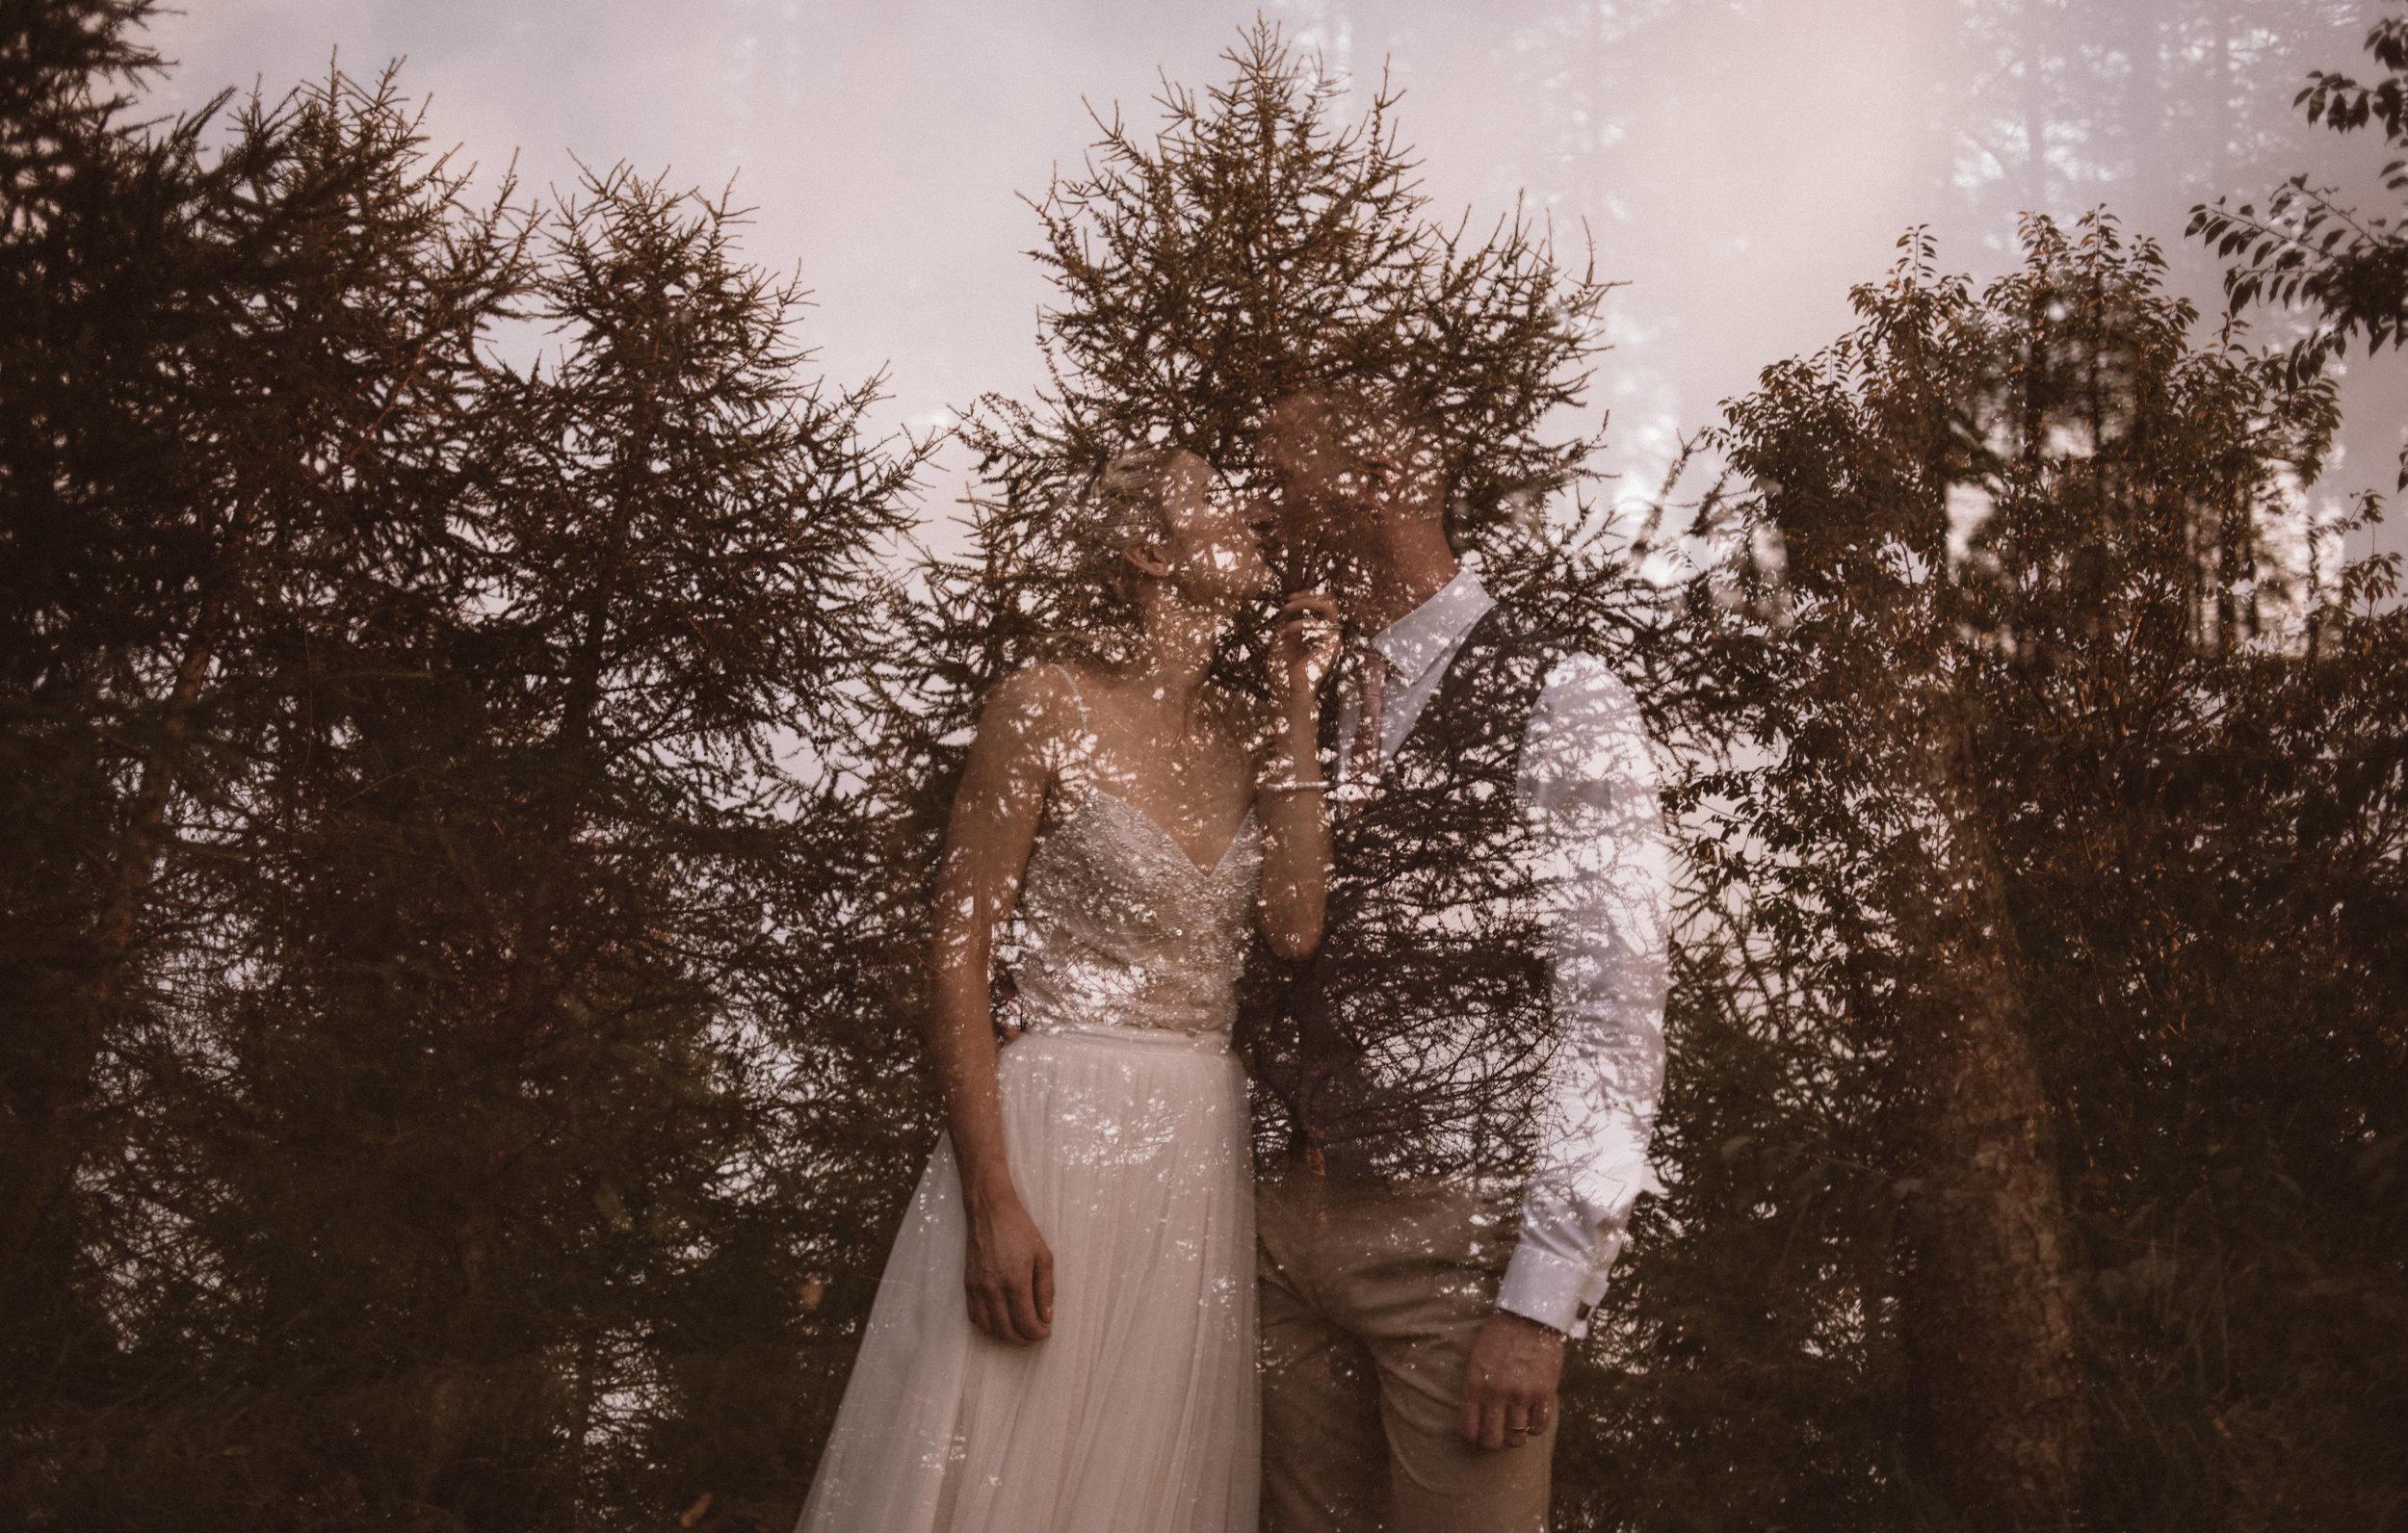 alternative wedding photography cornwall harrera images-024.jpg